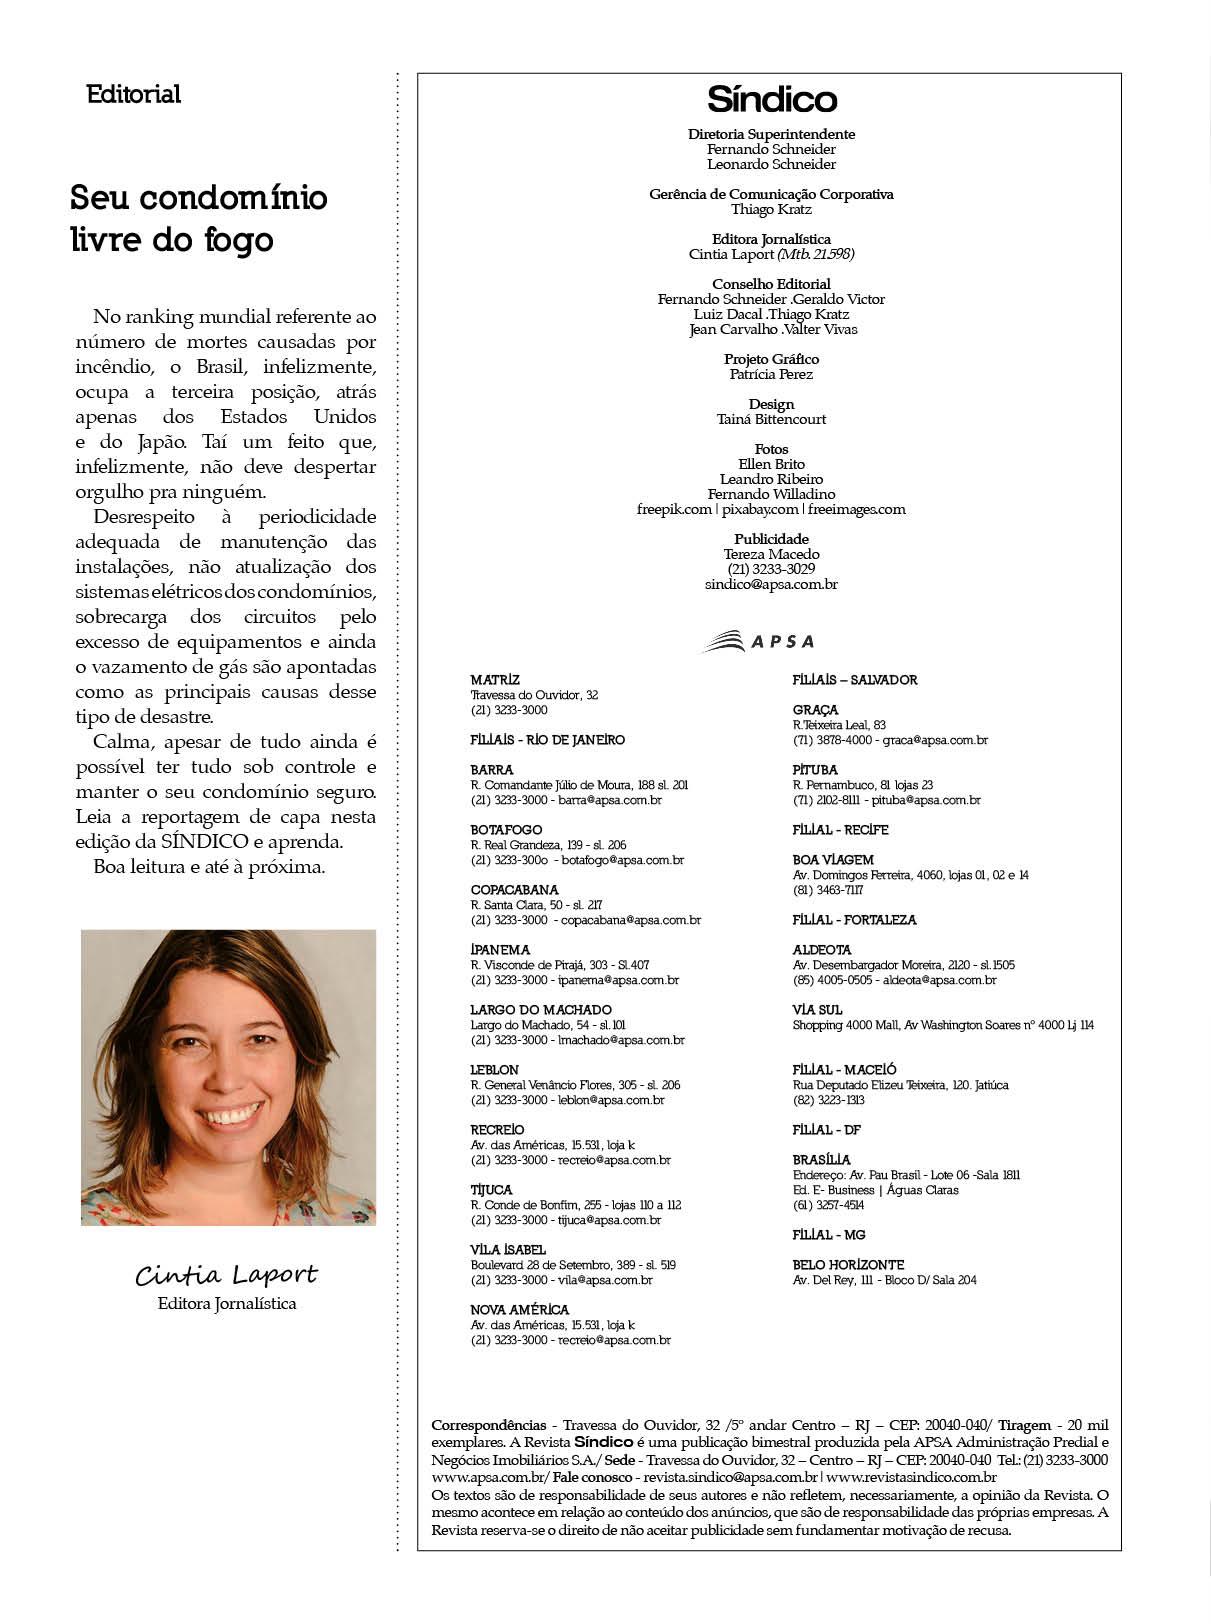 Revista Síndico_ed 2392